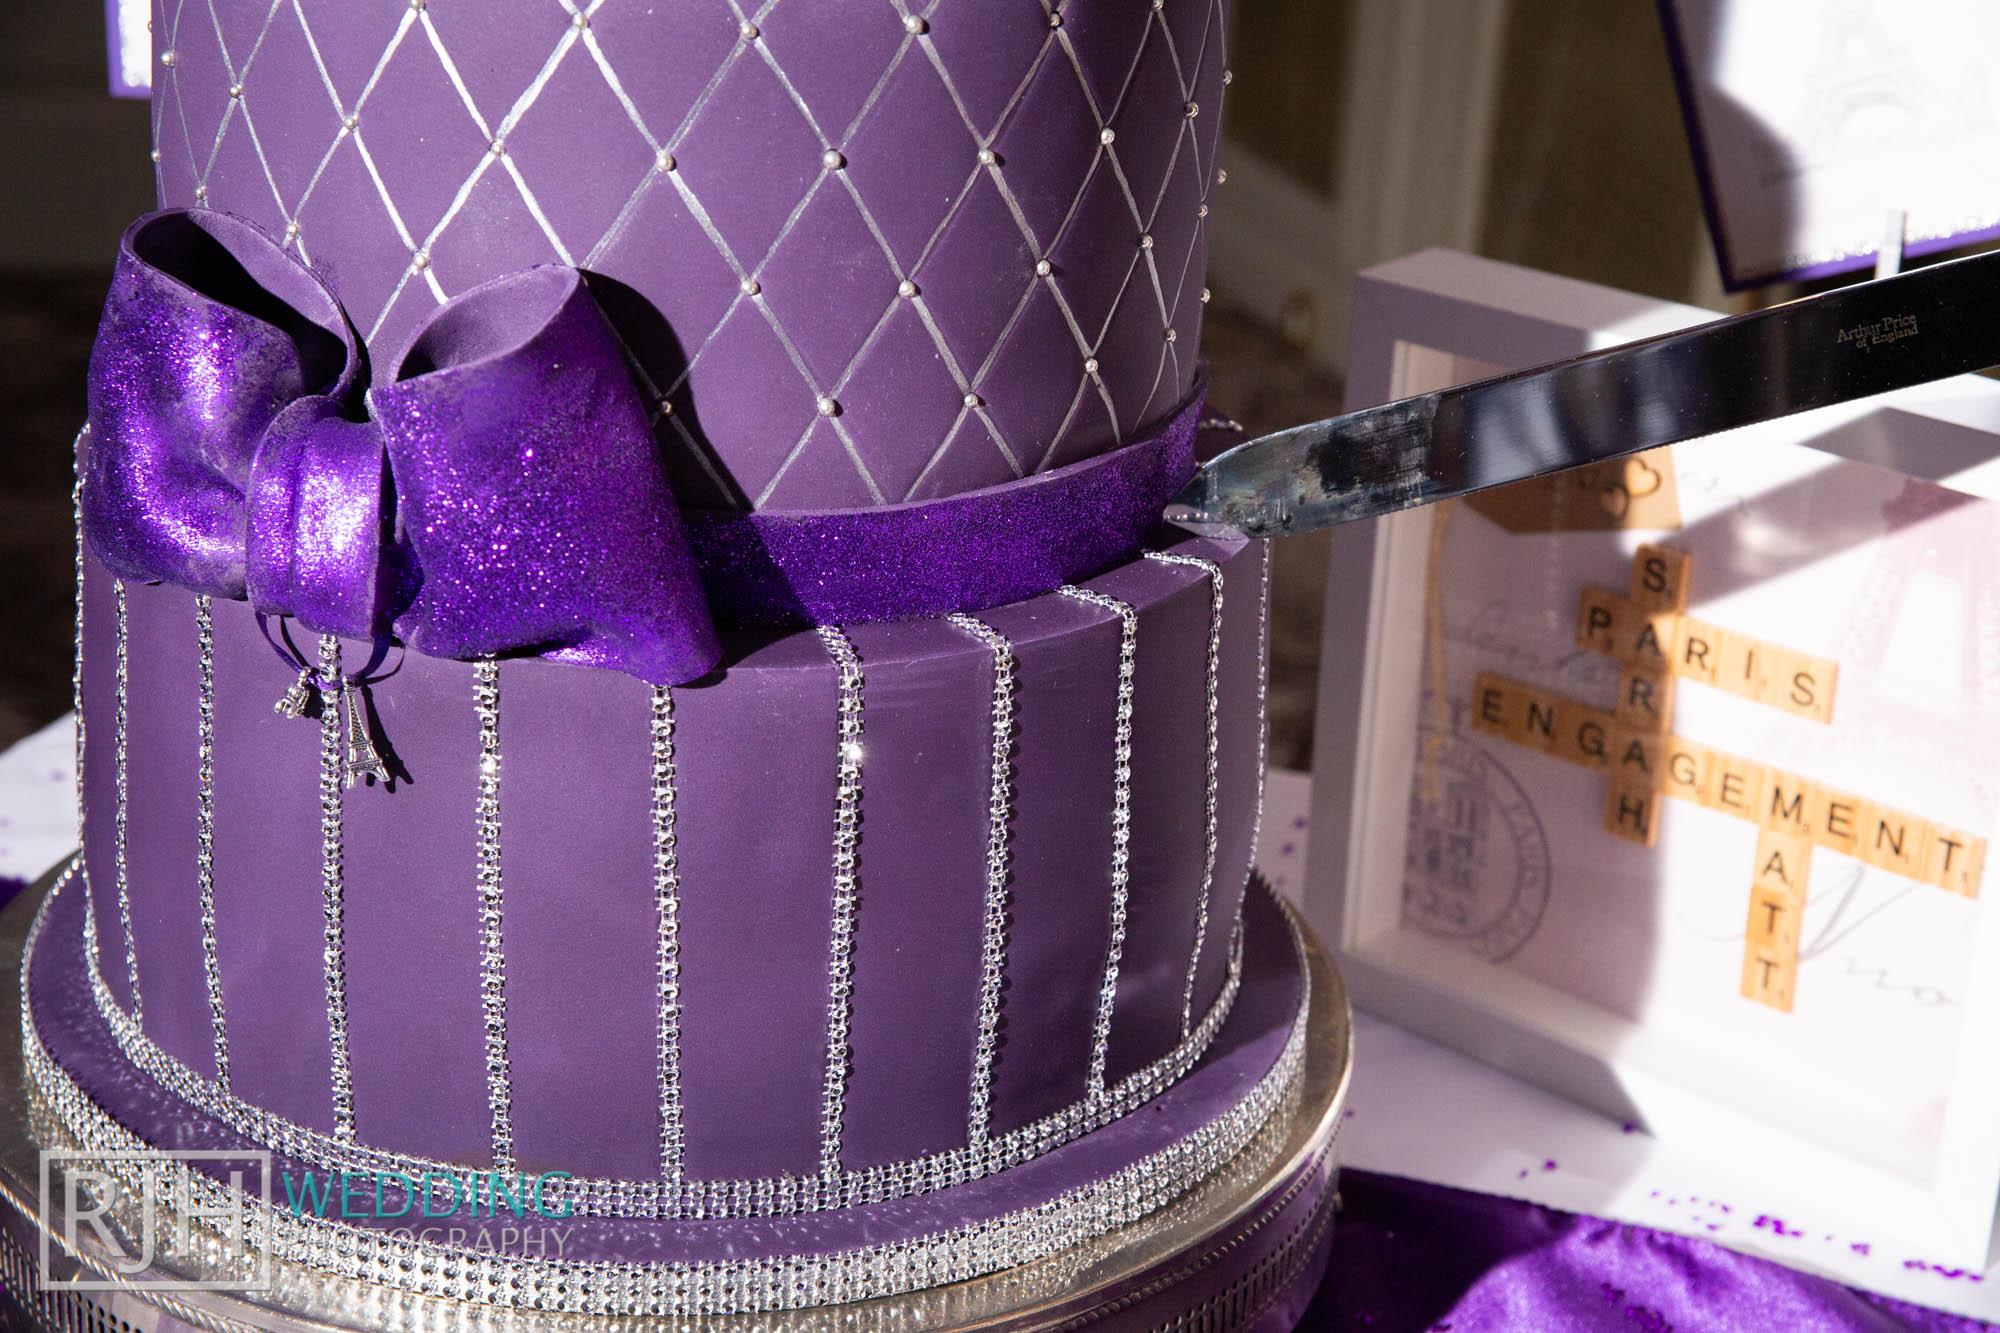 Oulton Hall Wedding Photography_Goodwill-Hall_053_IMG_6952.jpg